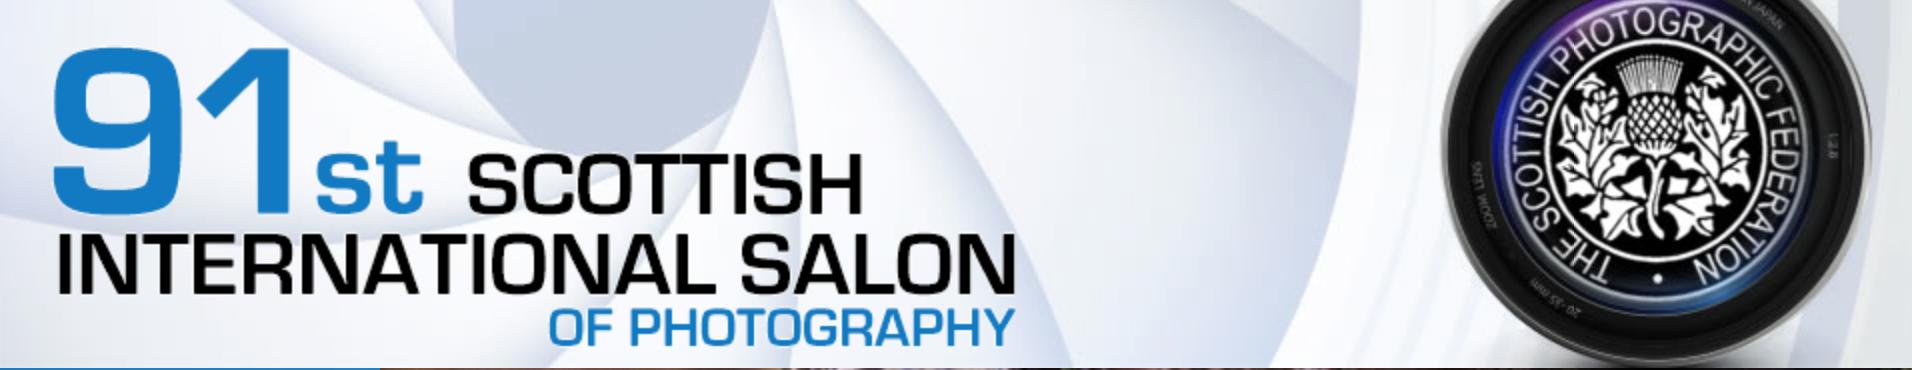 http://www.scottish-photographic-salon.org